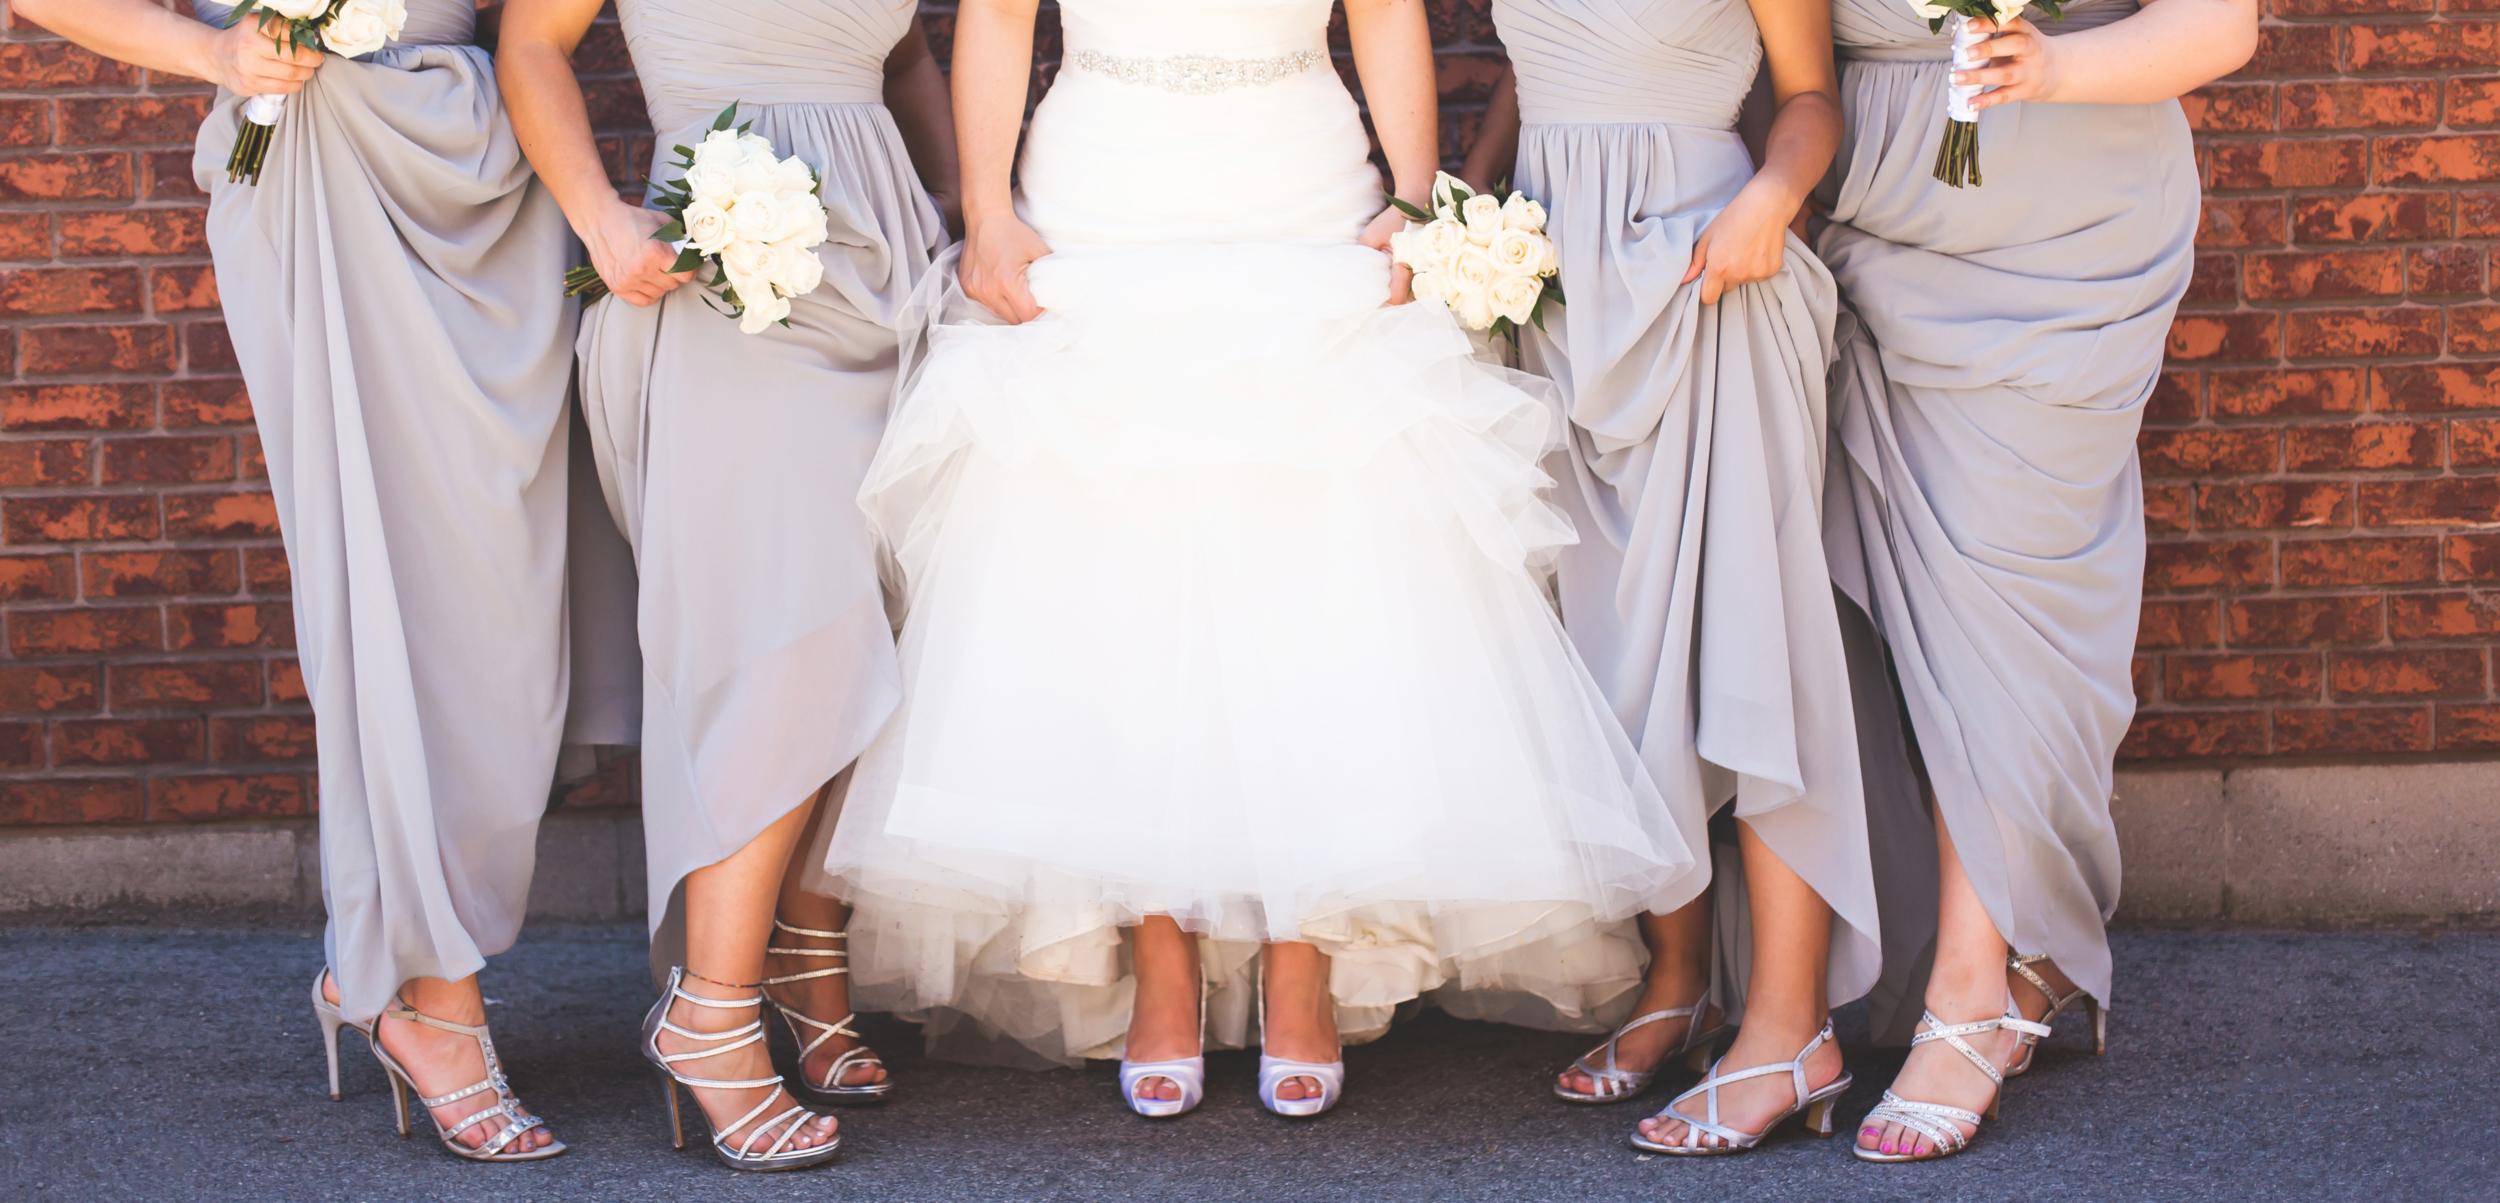 Wedding-Harbour-Banquet-Center-Oakville-Photographer-Wedding-Hamilton-Saint-James-Espresso-Downtown-HamOnt-GTA-Niagara-Toronto-Moments-by-Lauren-Photography-Photo-Image-39.png